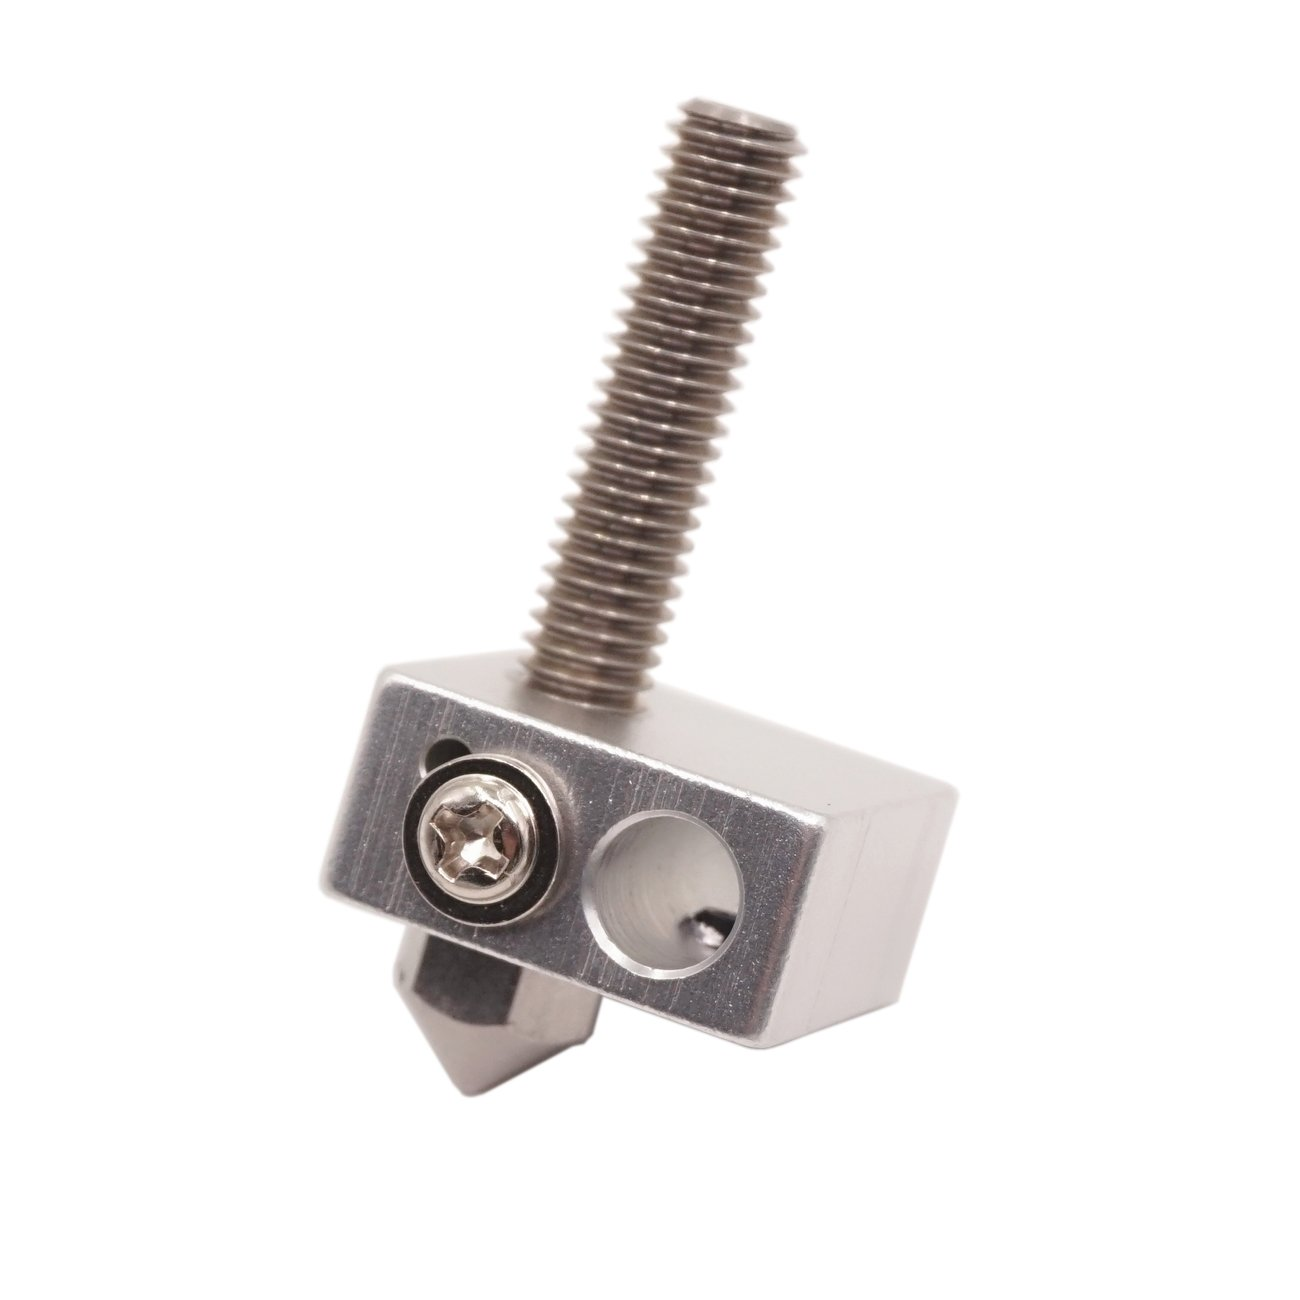 WINSINN Stainless Steel Nozzle 0.4mm MK8 CR10 For 3D Printer Creality CR-10 CR10 Ender 3 5 0.25mm 0.3mm 0.4mm 0.5mm 0.6mm 0.8mm Extruder Print Head Pack of 20Pcs